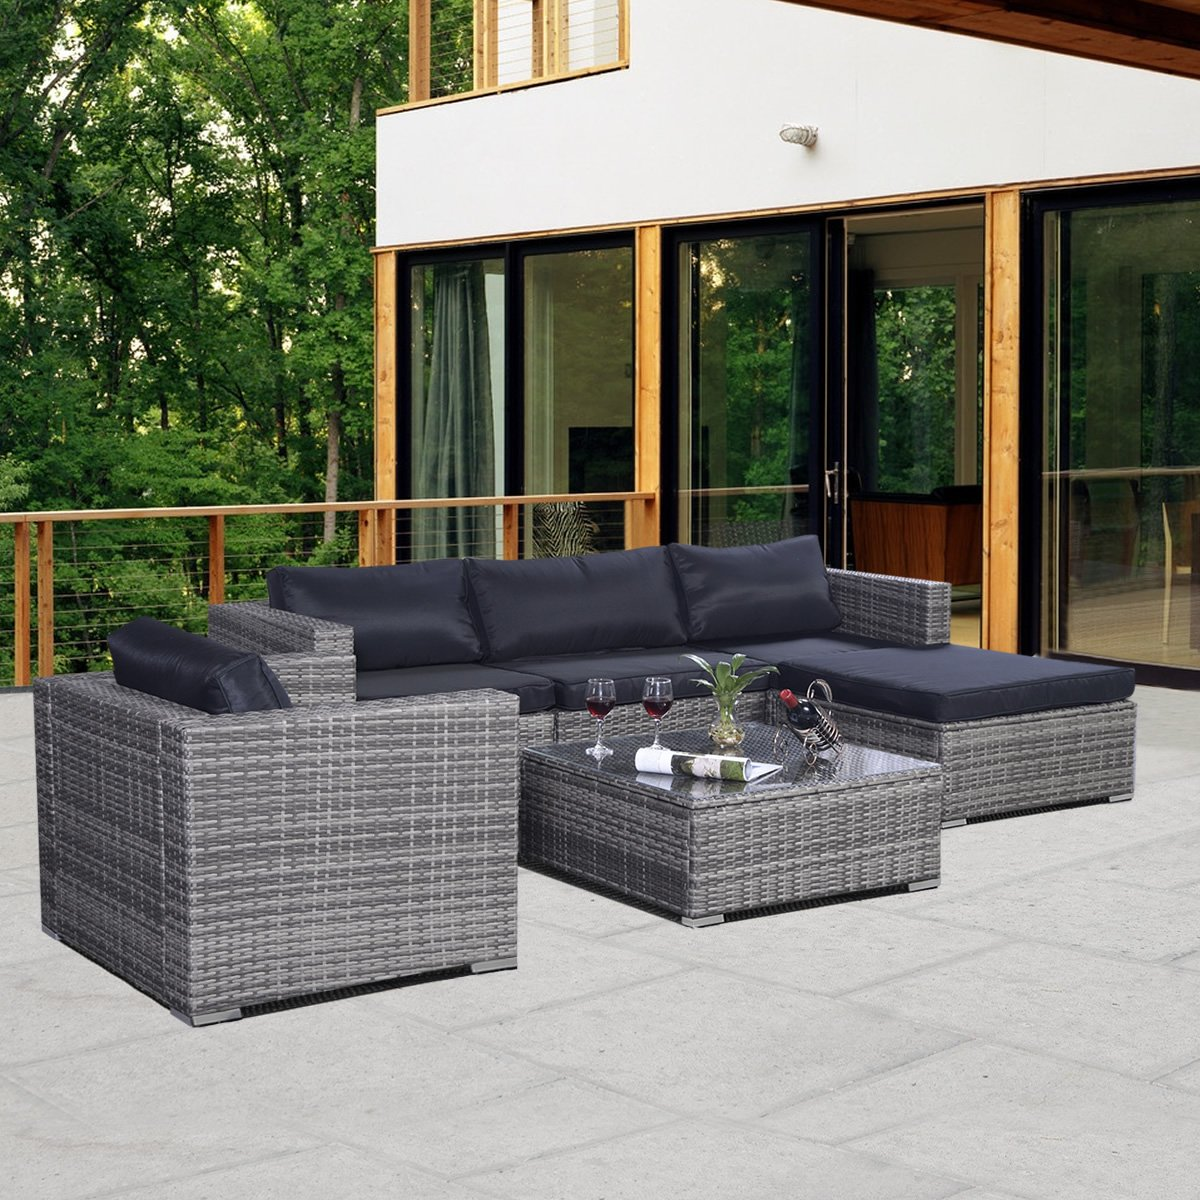 Nice Synthetic Rattan Garden Furniture Set 13: Amazon.co.uk: Garden U0026 Outdoors Design Inspirations